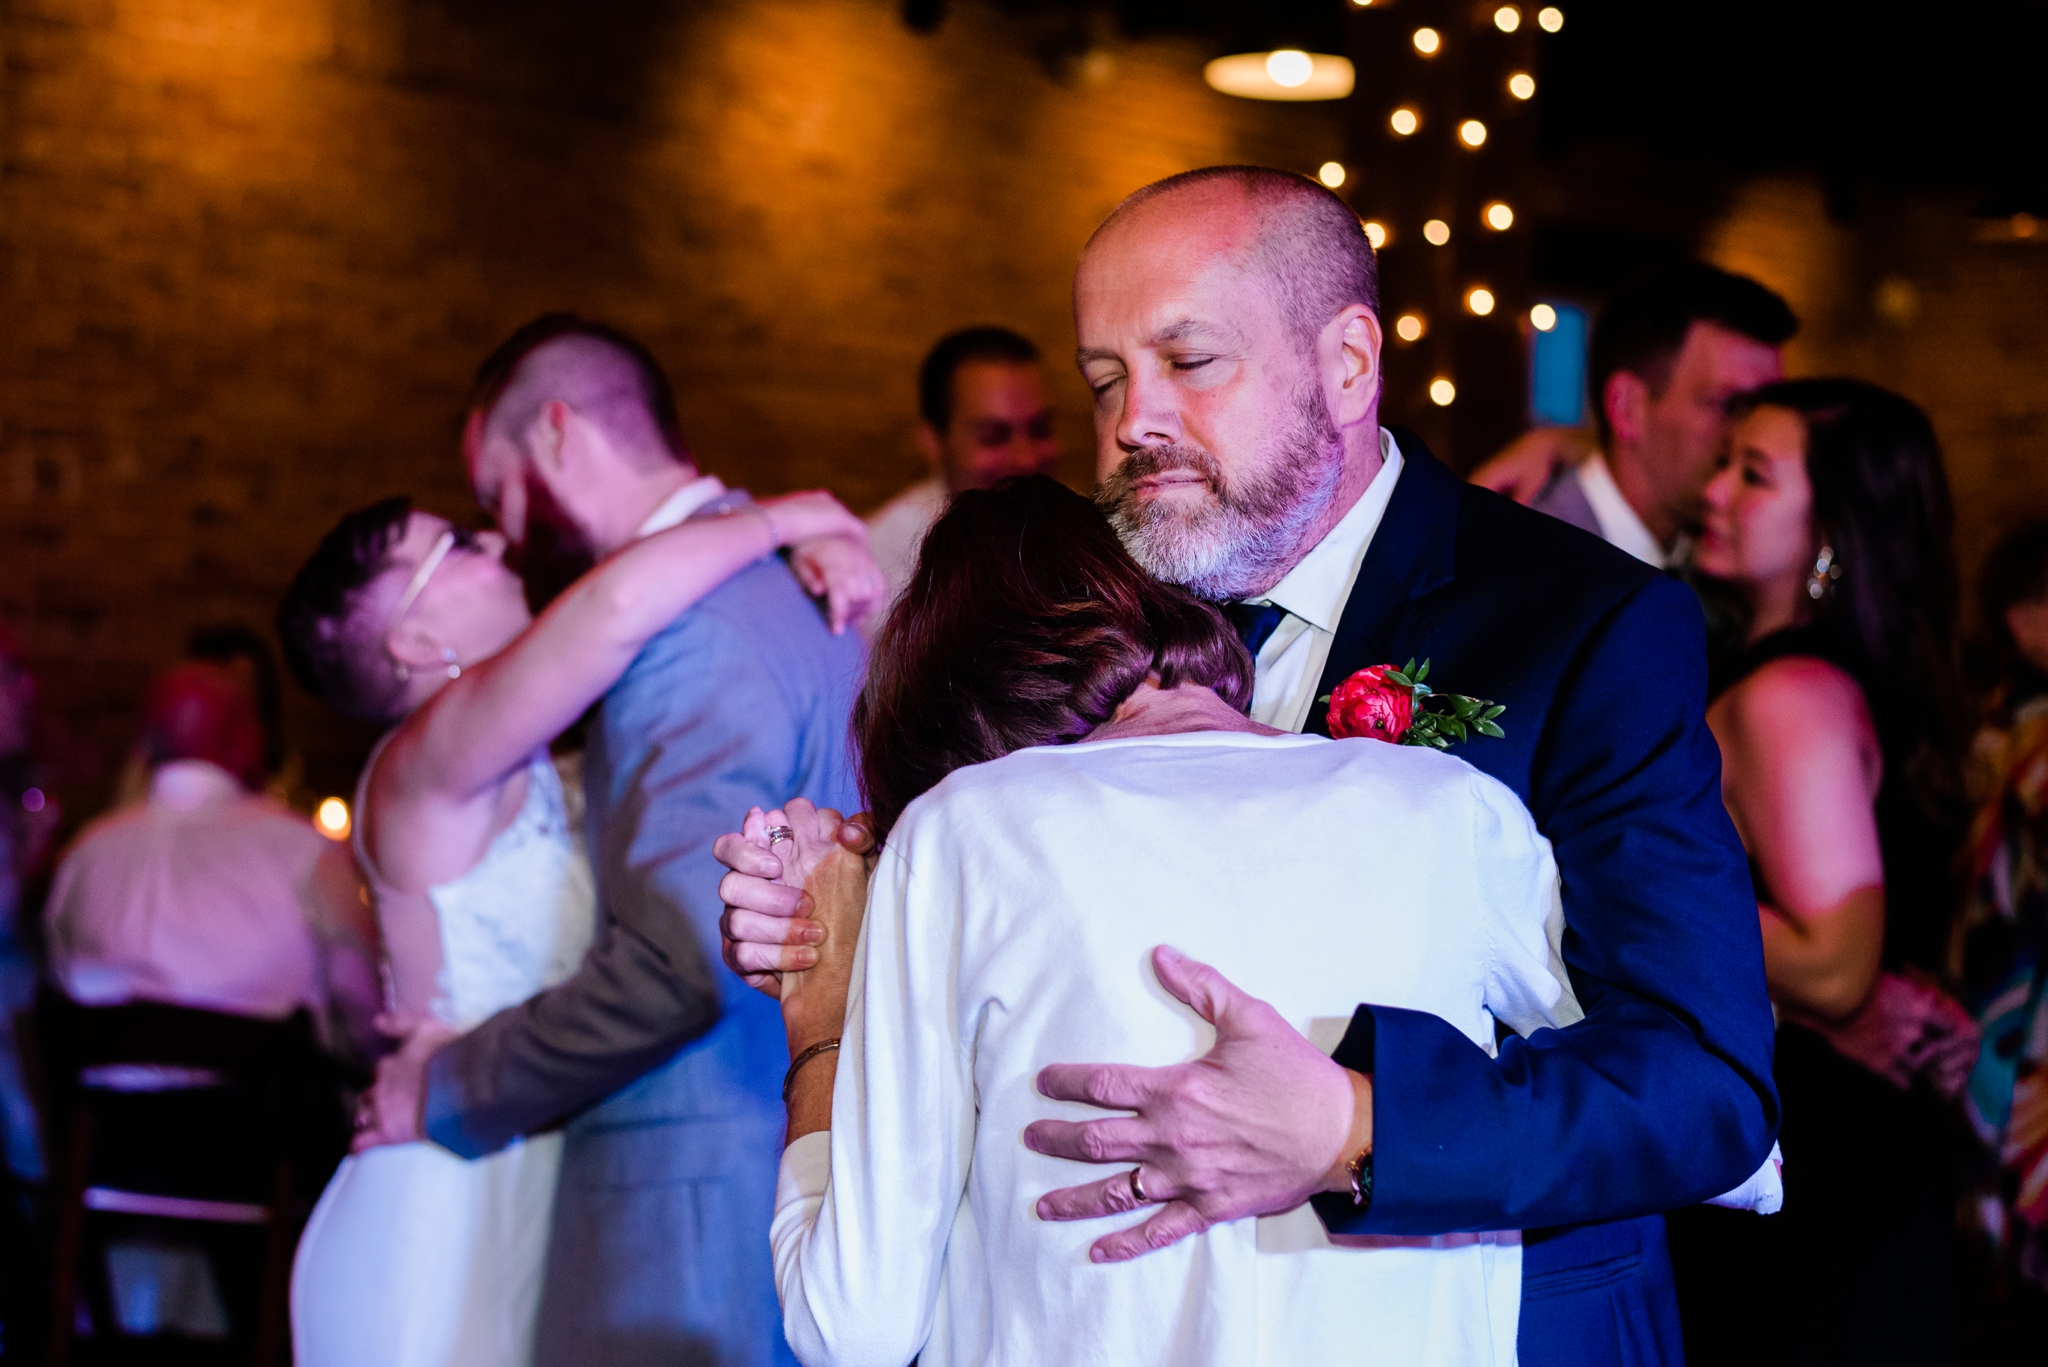 Emily Grace Photography, Lancaster PA Wedding Photographer, The Booking House Wedding Venue, Manheim PA Wedding Venue, The Booking House Manheim Reception Photos, Central PA Wedding Photographer